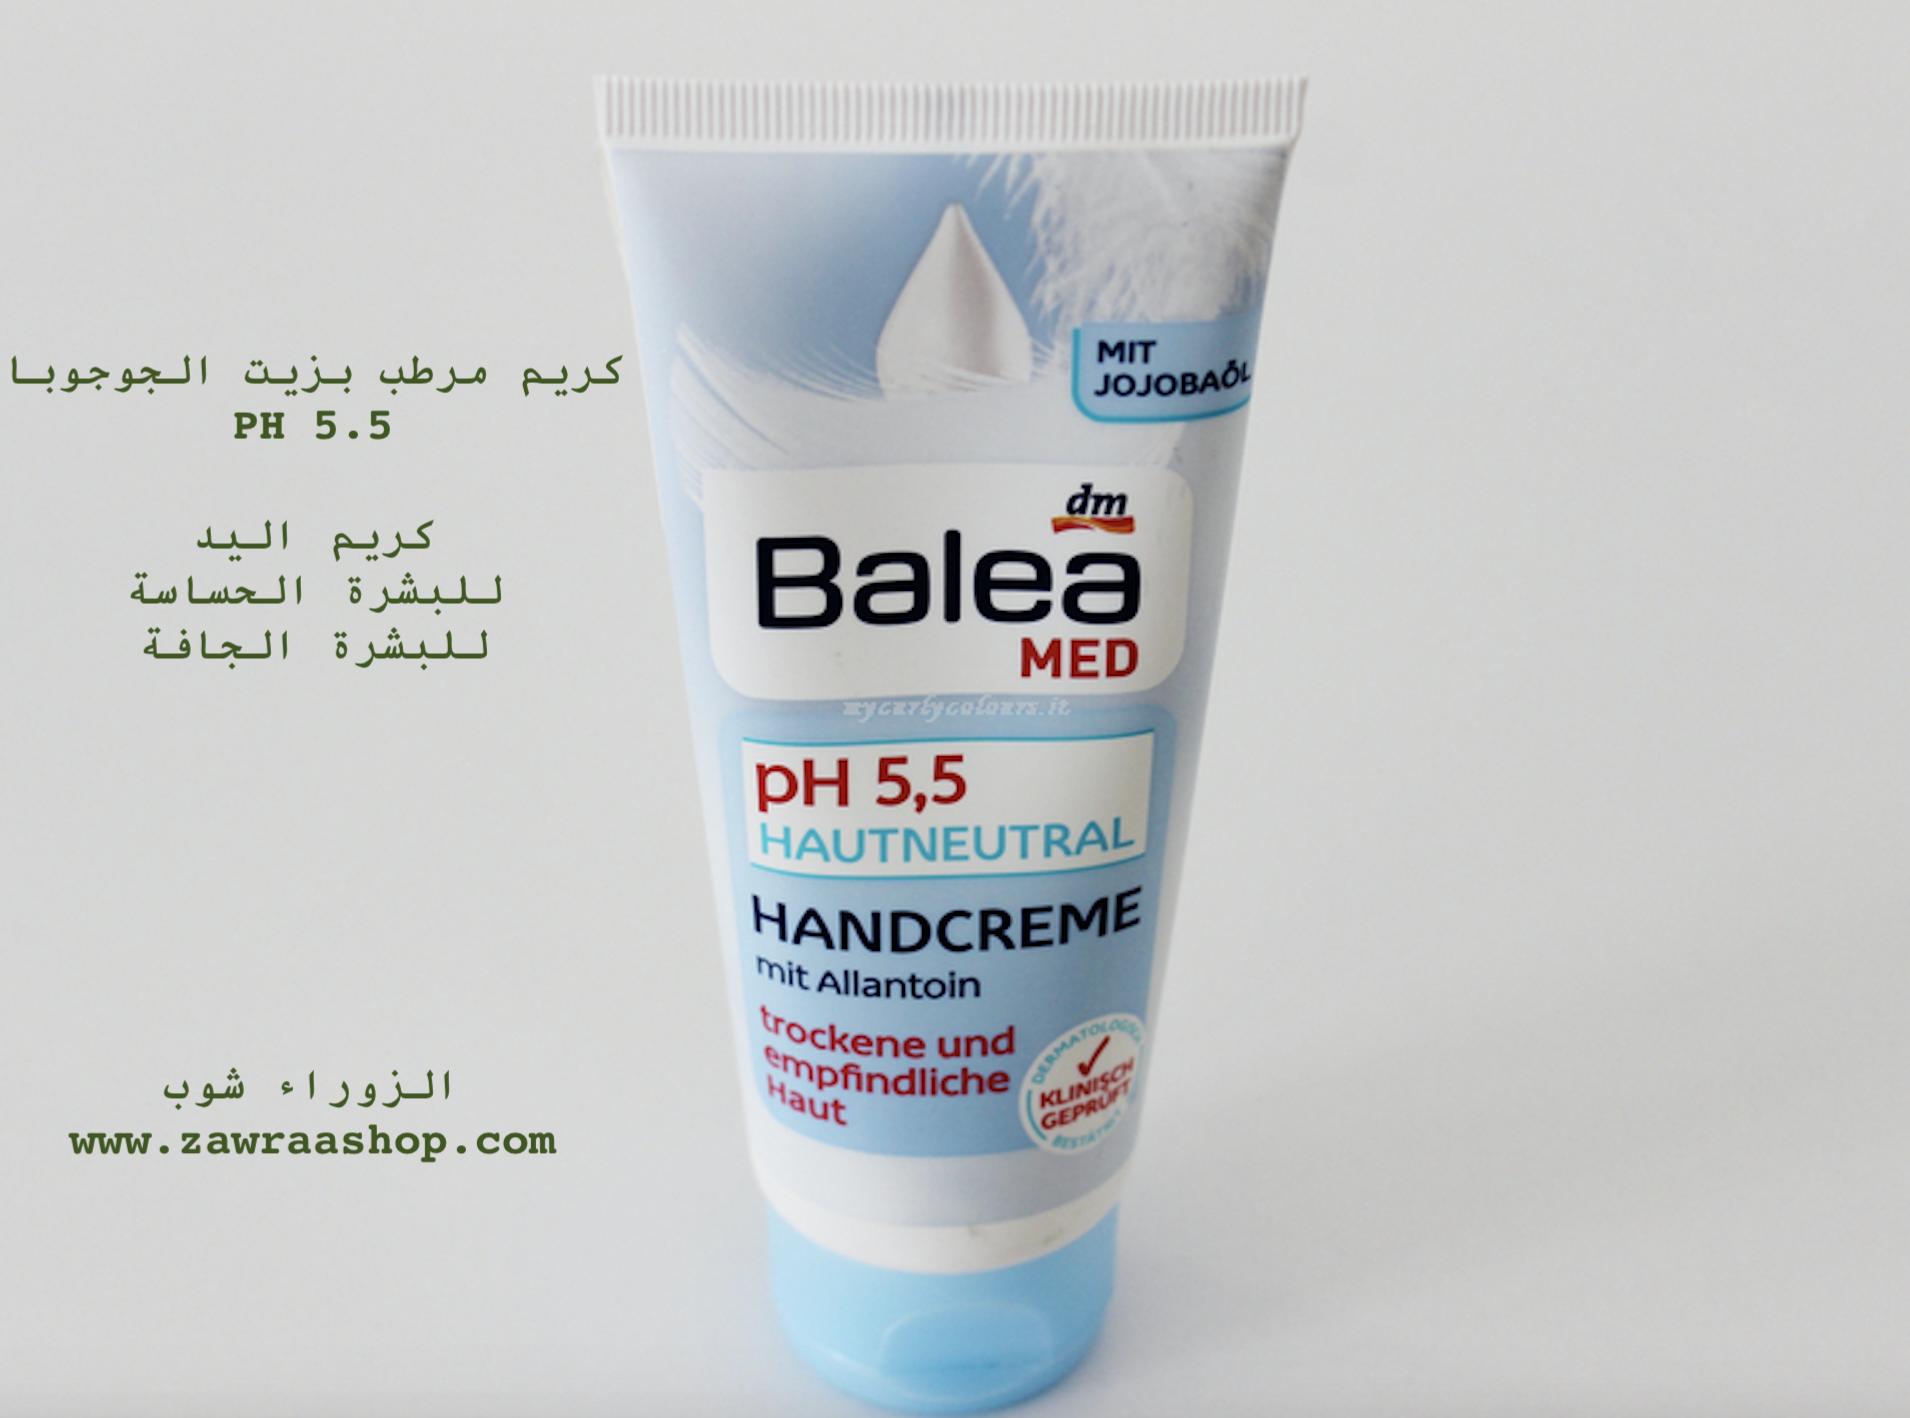 B203 ph 5,5 hautneutral handcreme 100ml كريم يد 00423